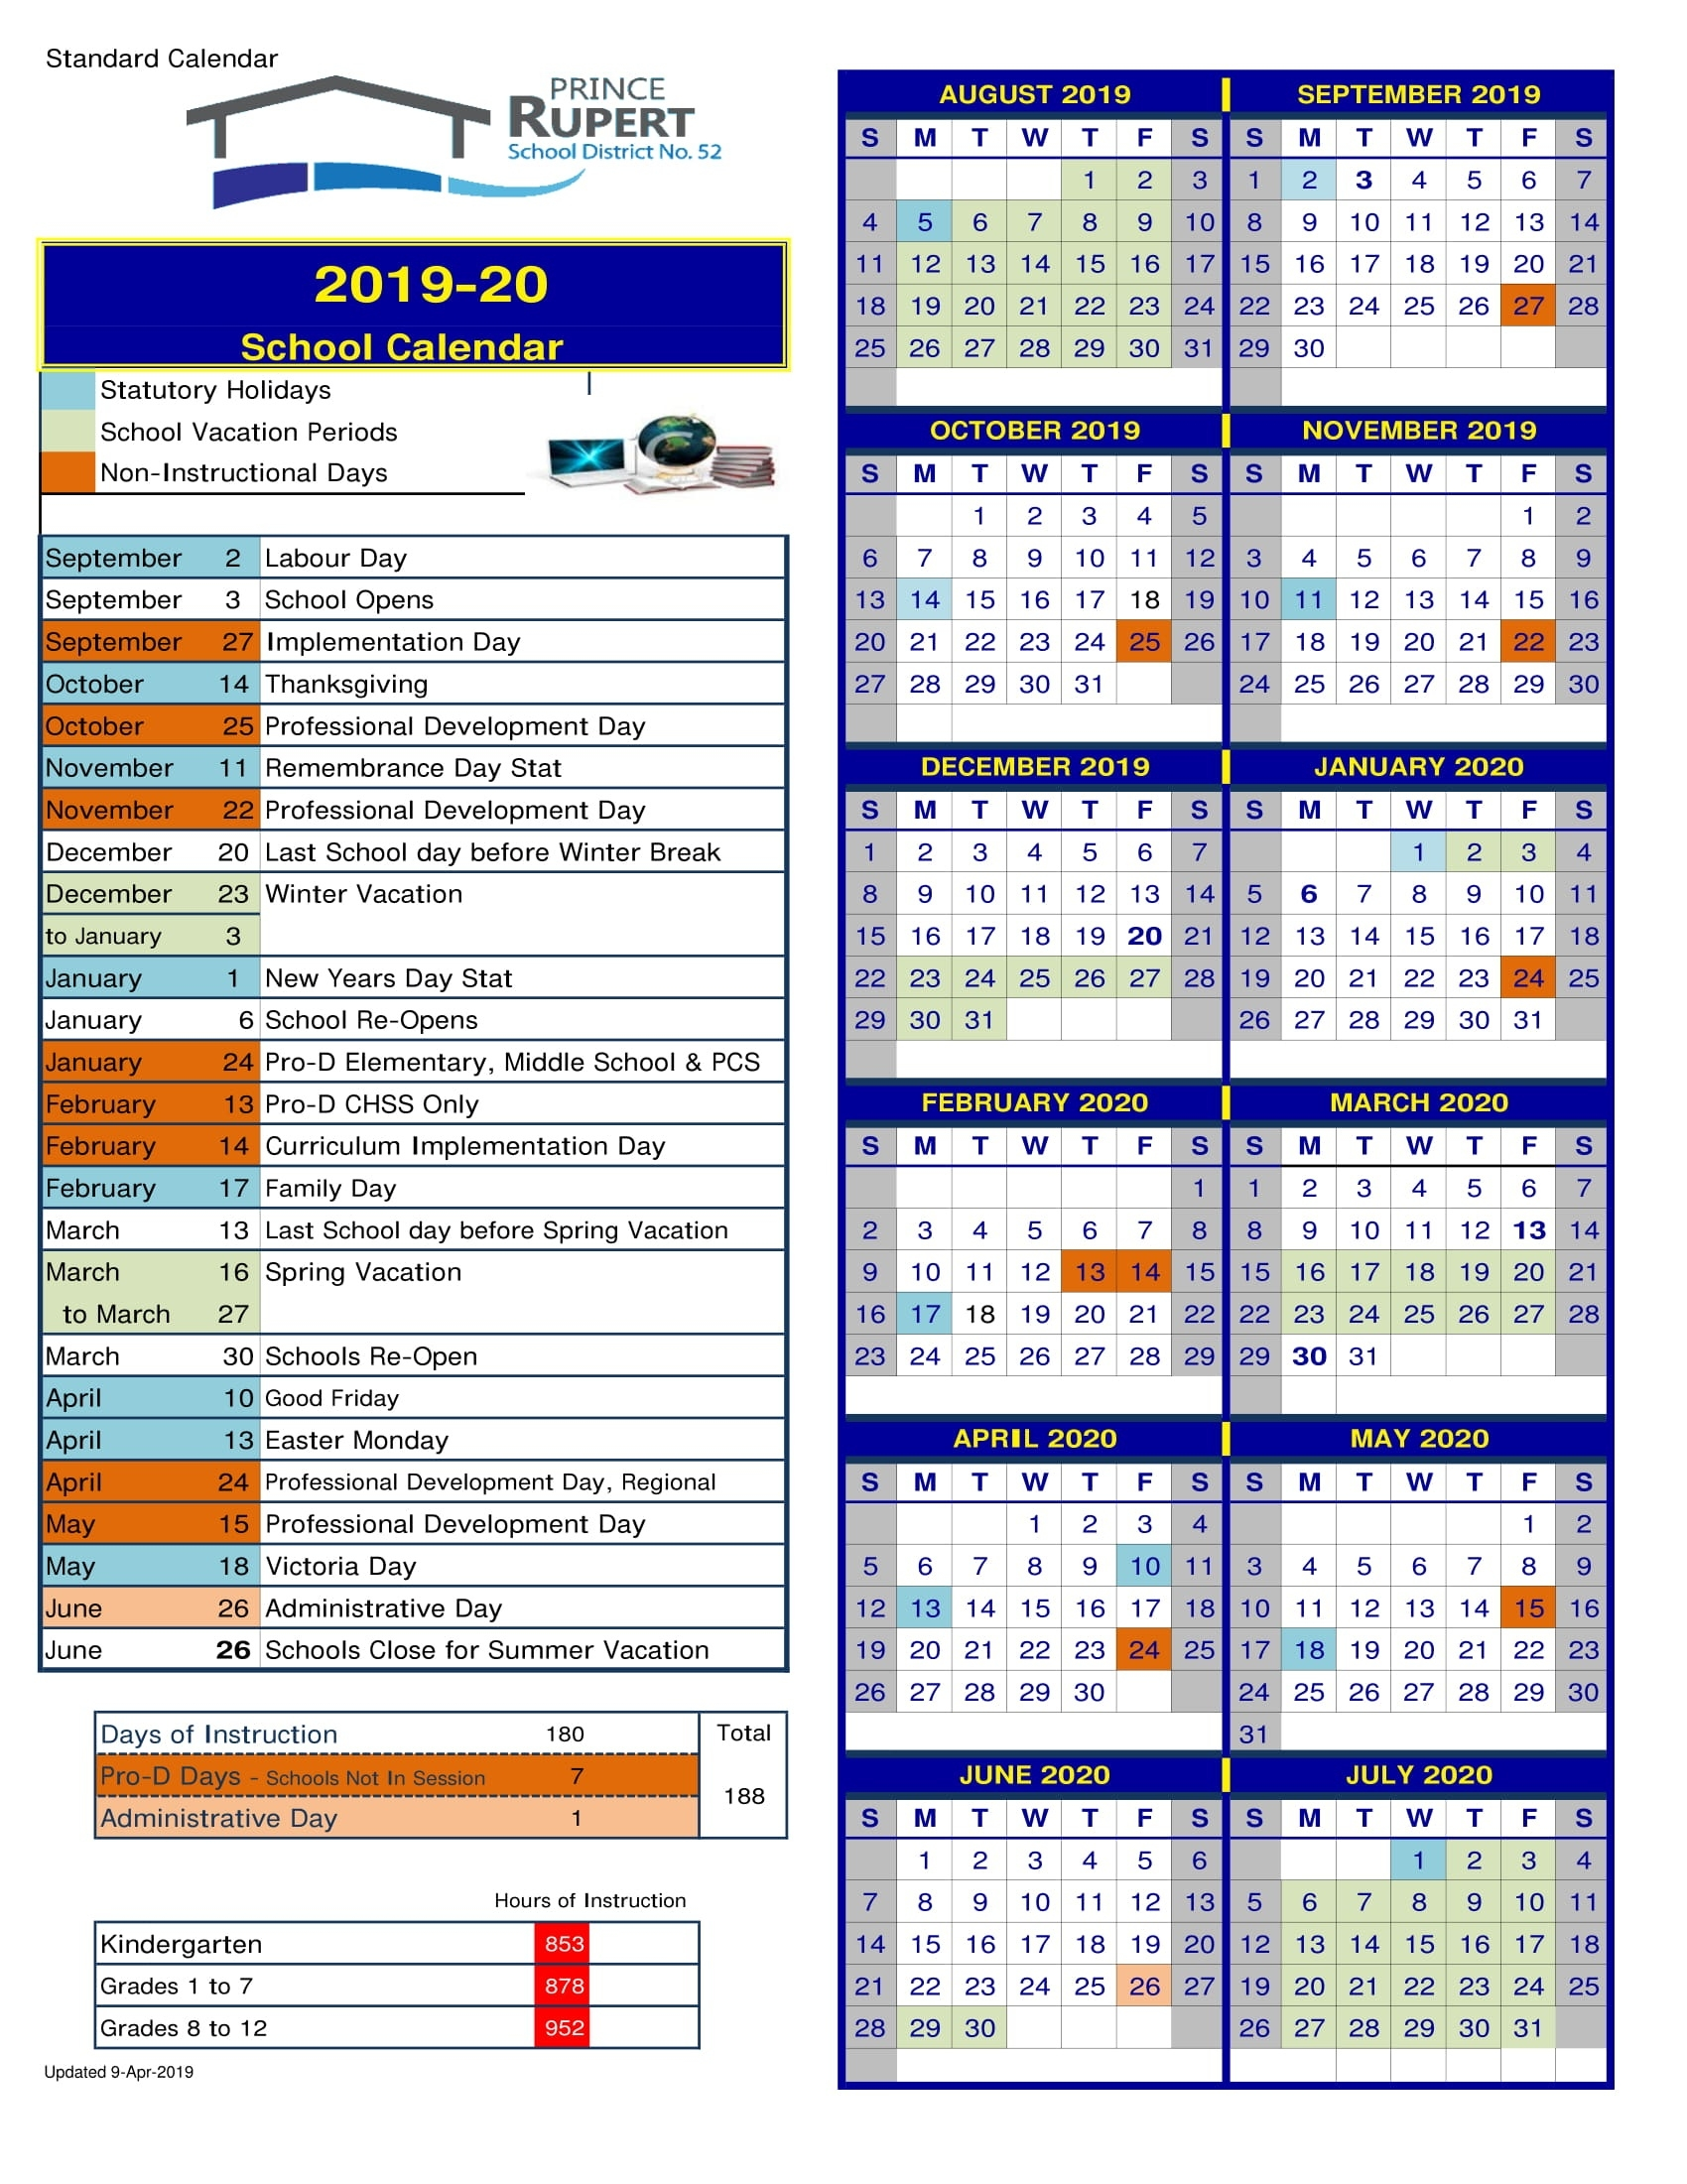 District School Calendar | School District 52_District 7 School Calendar